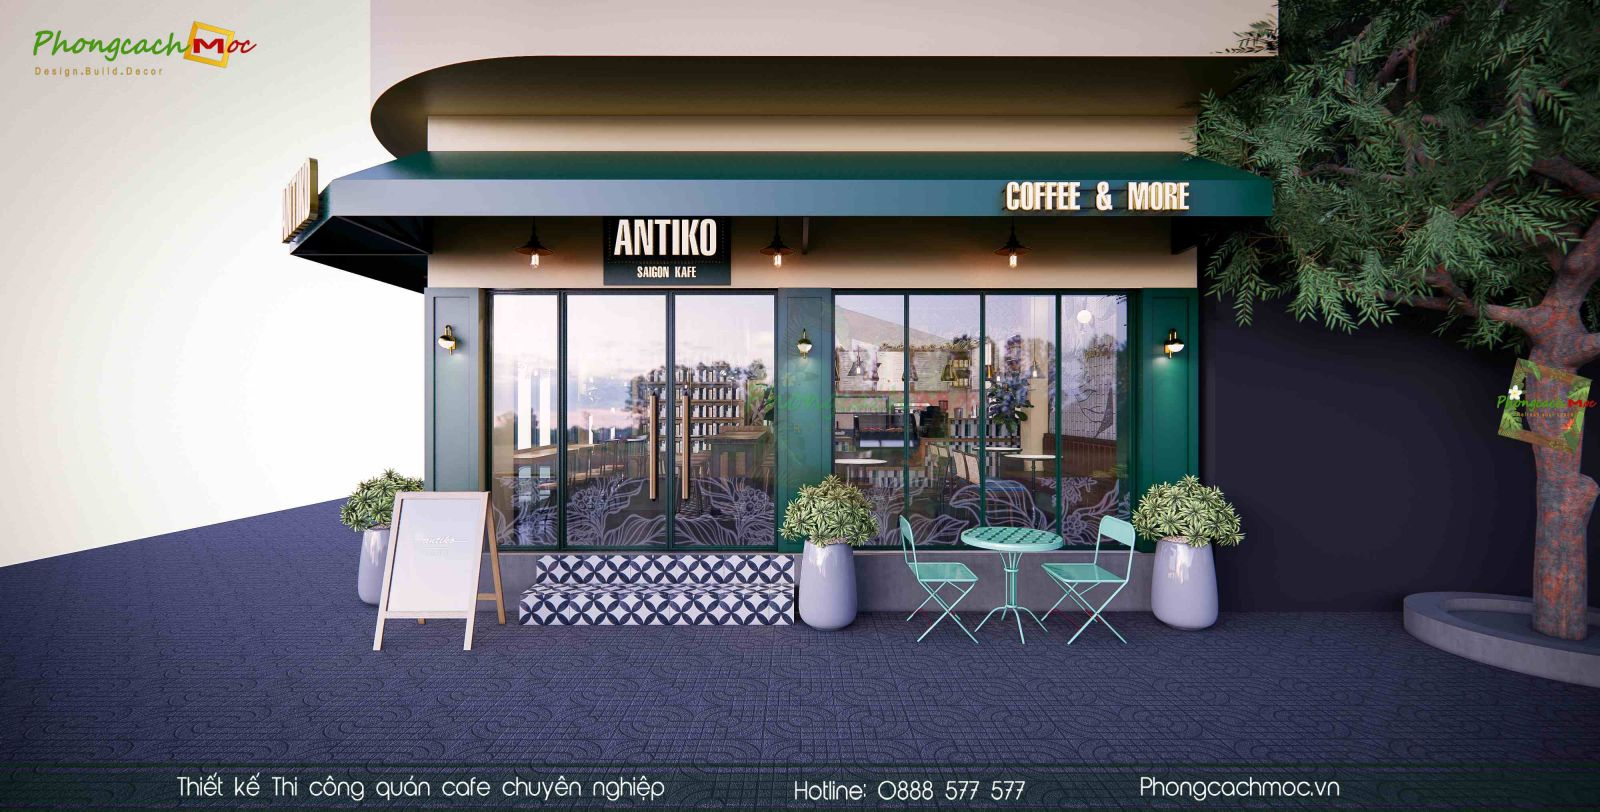 Thiet ke quan cafe Antiki Saigon Kafe